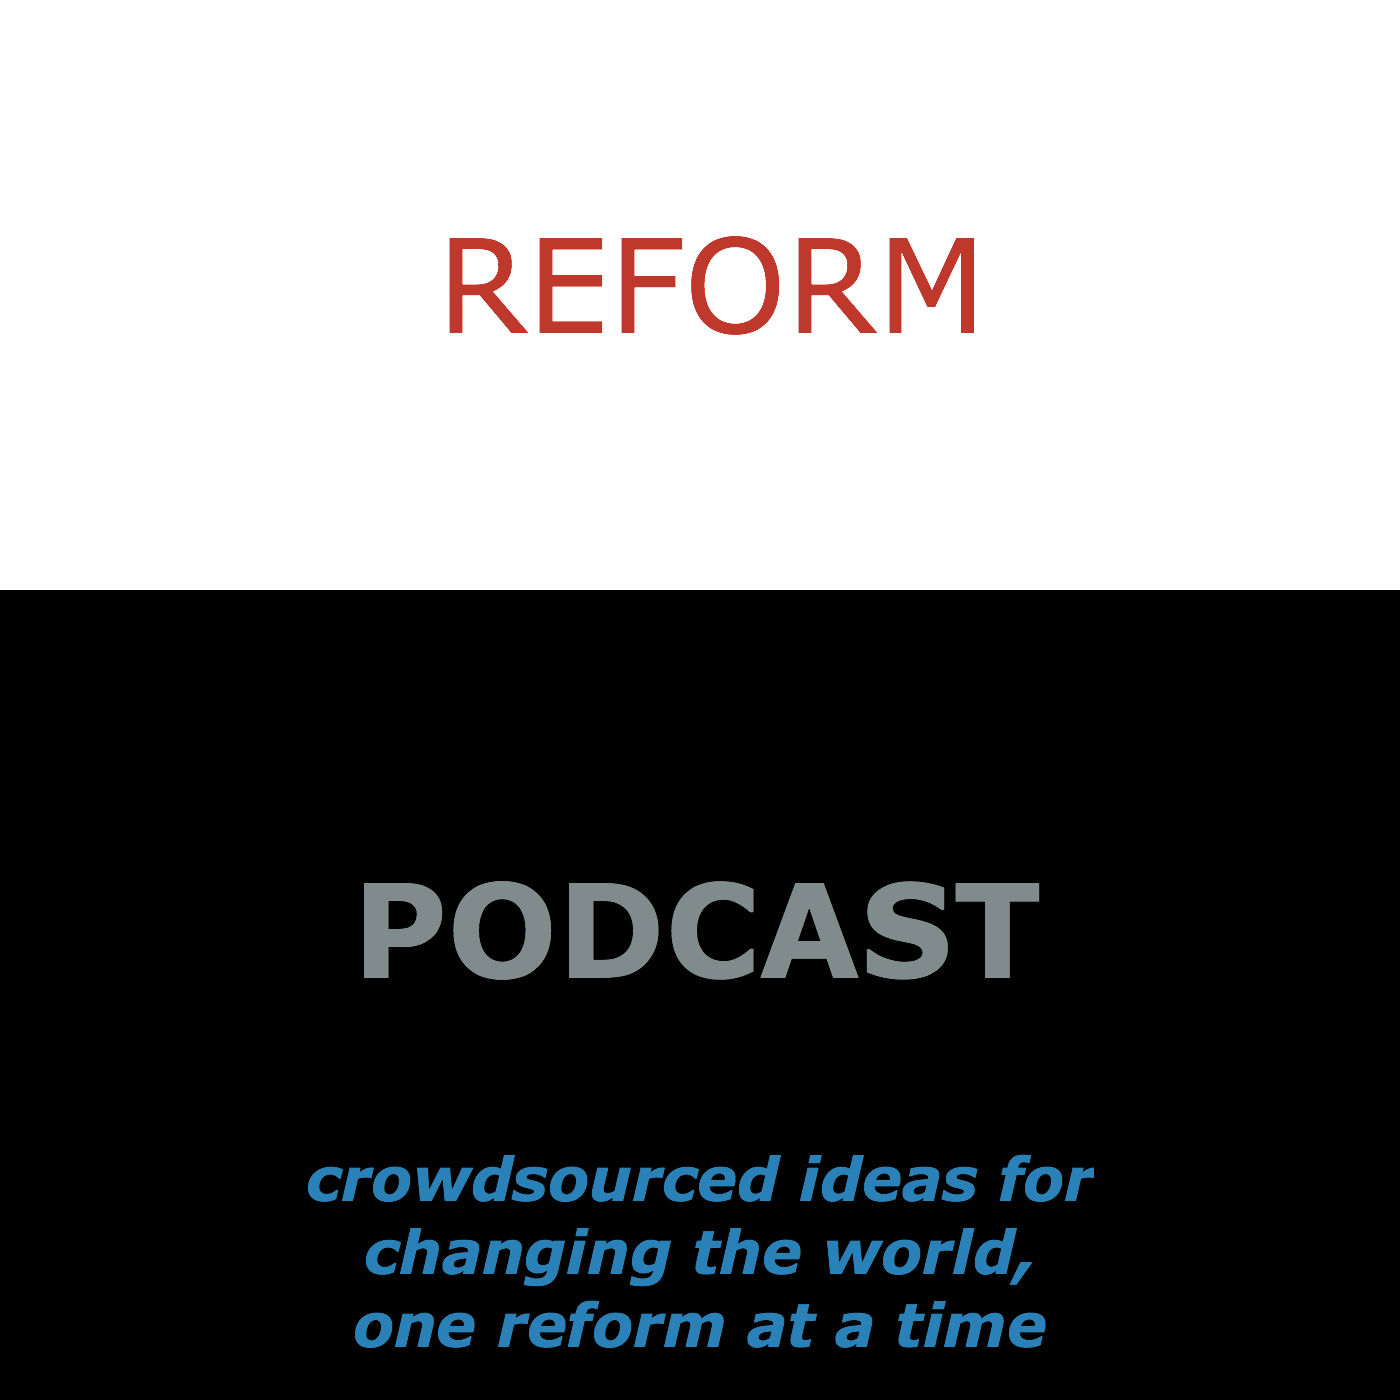 Reform Podcast